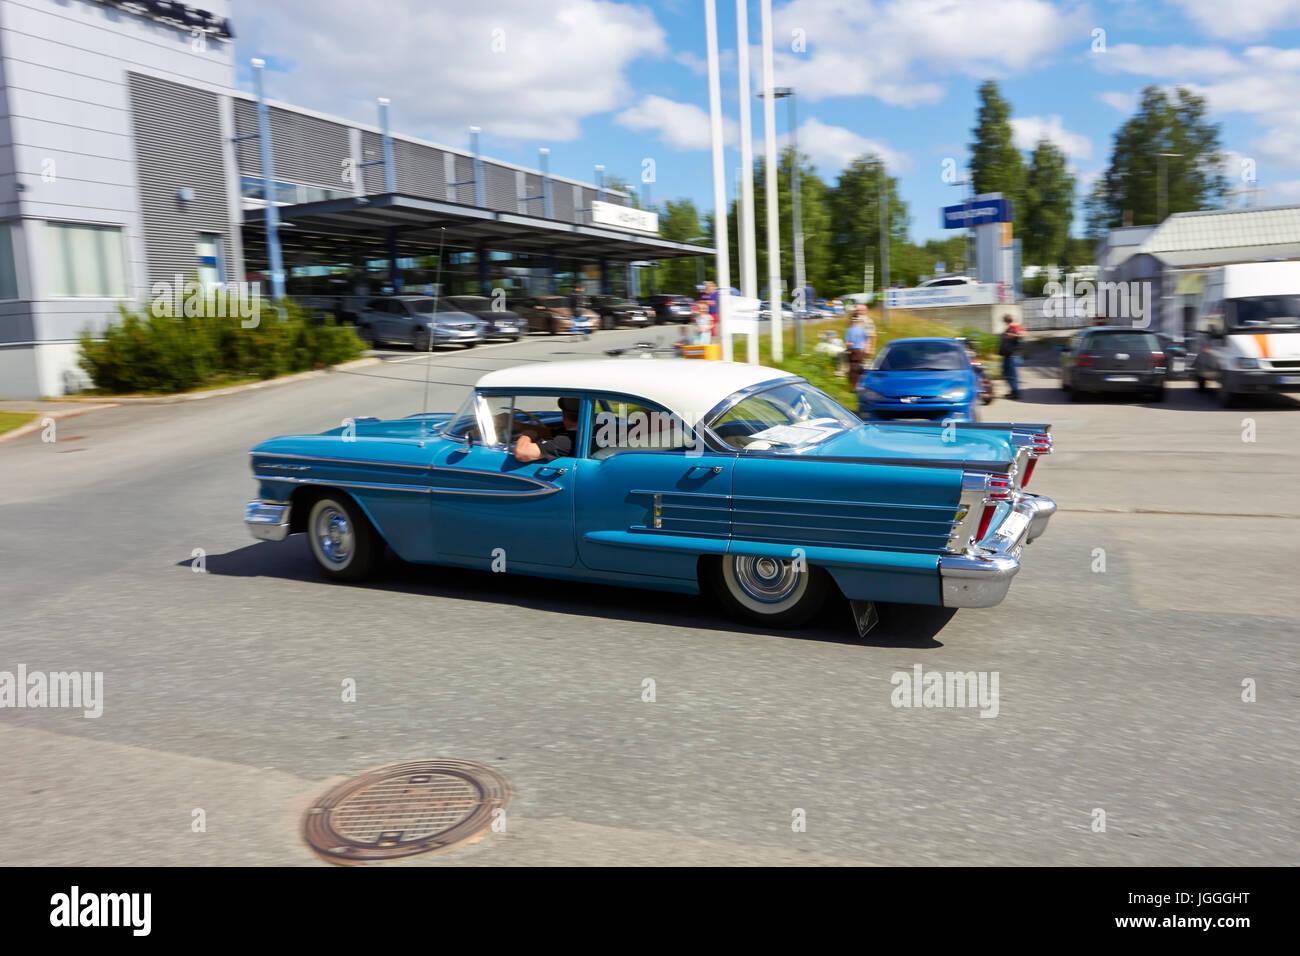 1958 Oldsmobile Super 88 Stock Photos & 1958 Oldsmobile Super 88